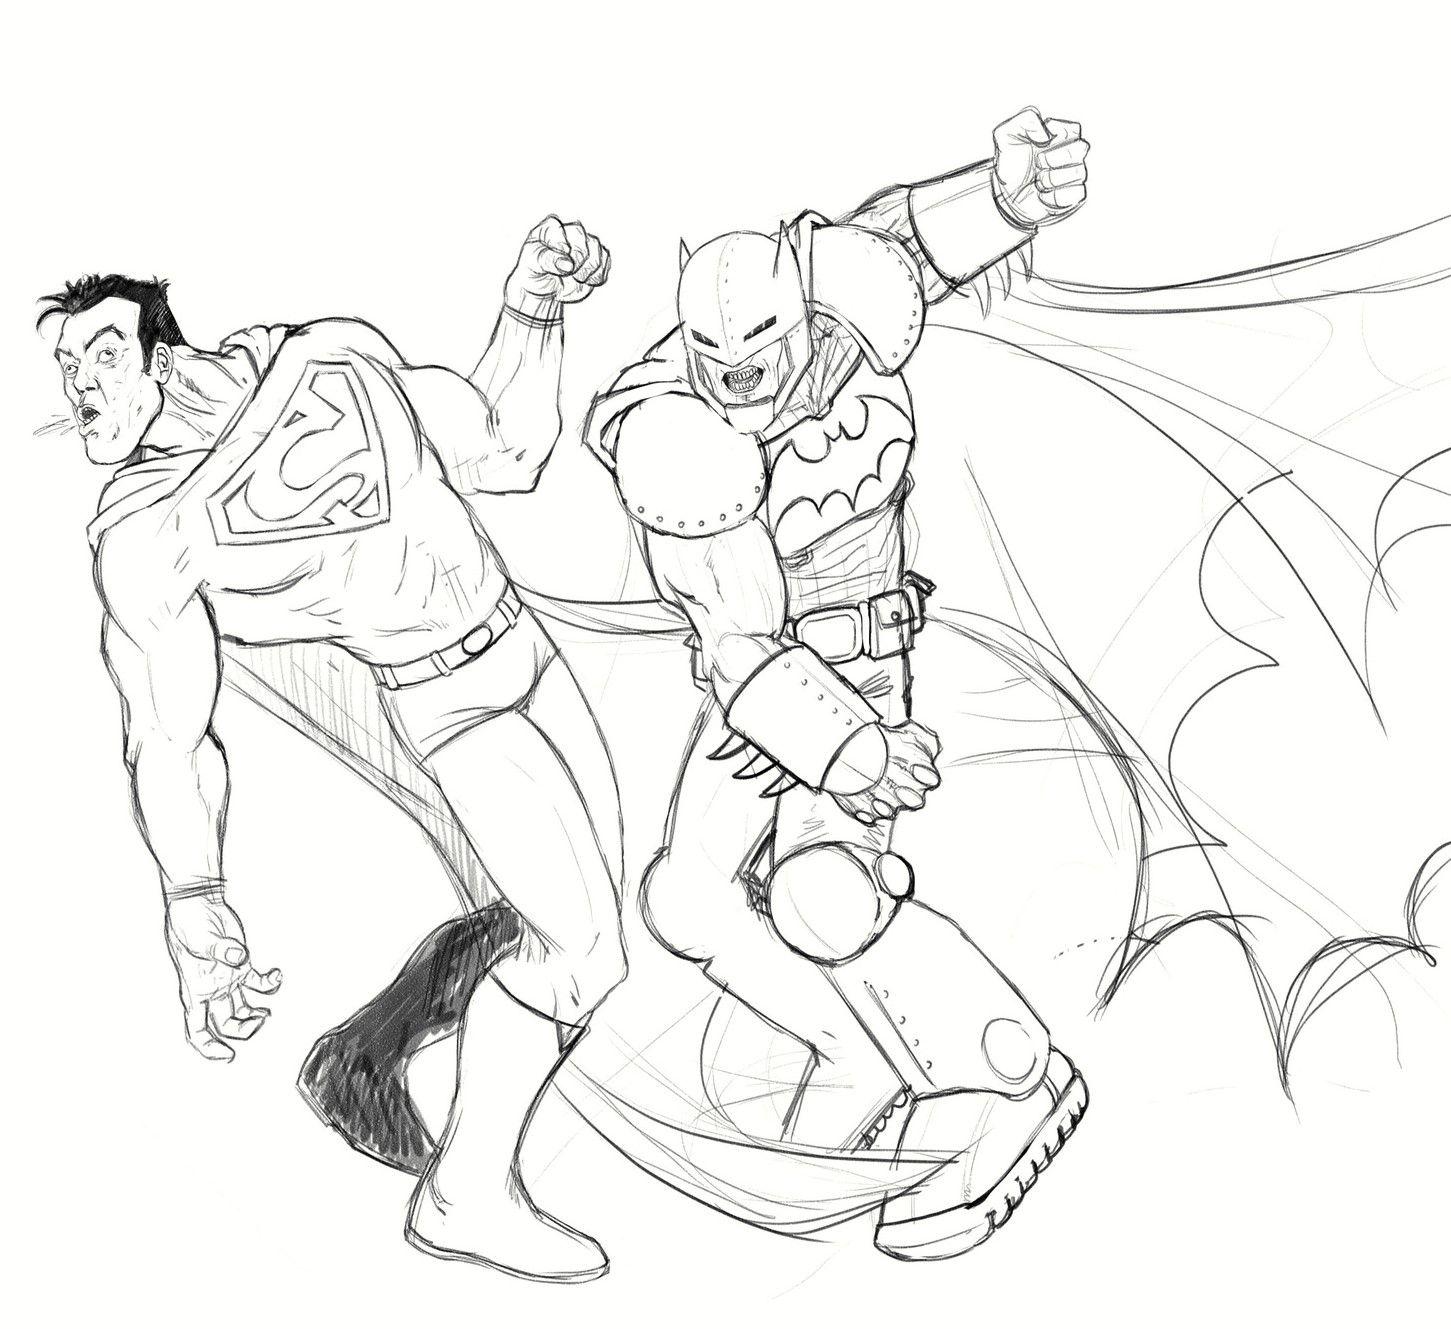 Batman V Superman Colouring Pages Superman Coloring Pages Avengers Coloring Pages Batman And Superman